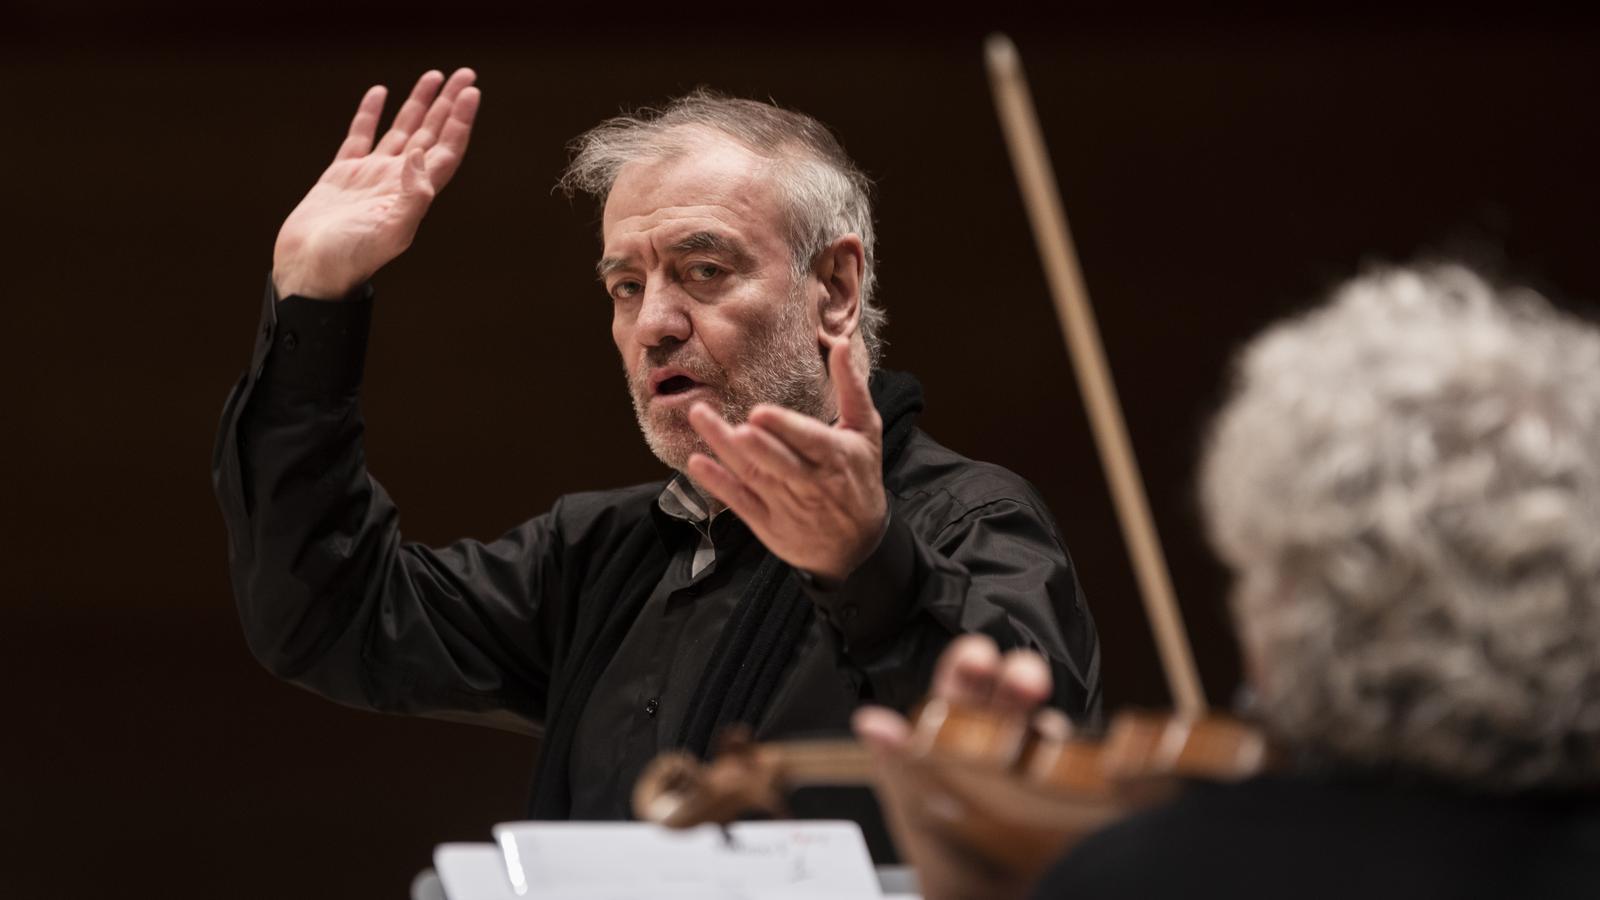 Valery Gergiev dirigint l'Orquestra del Mariinski a L'Auditori.